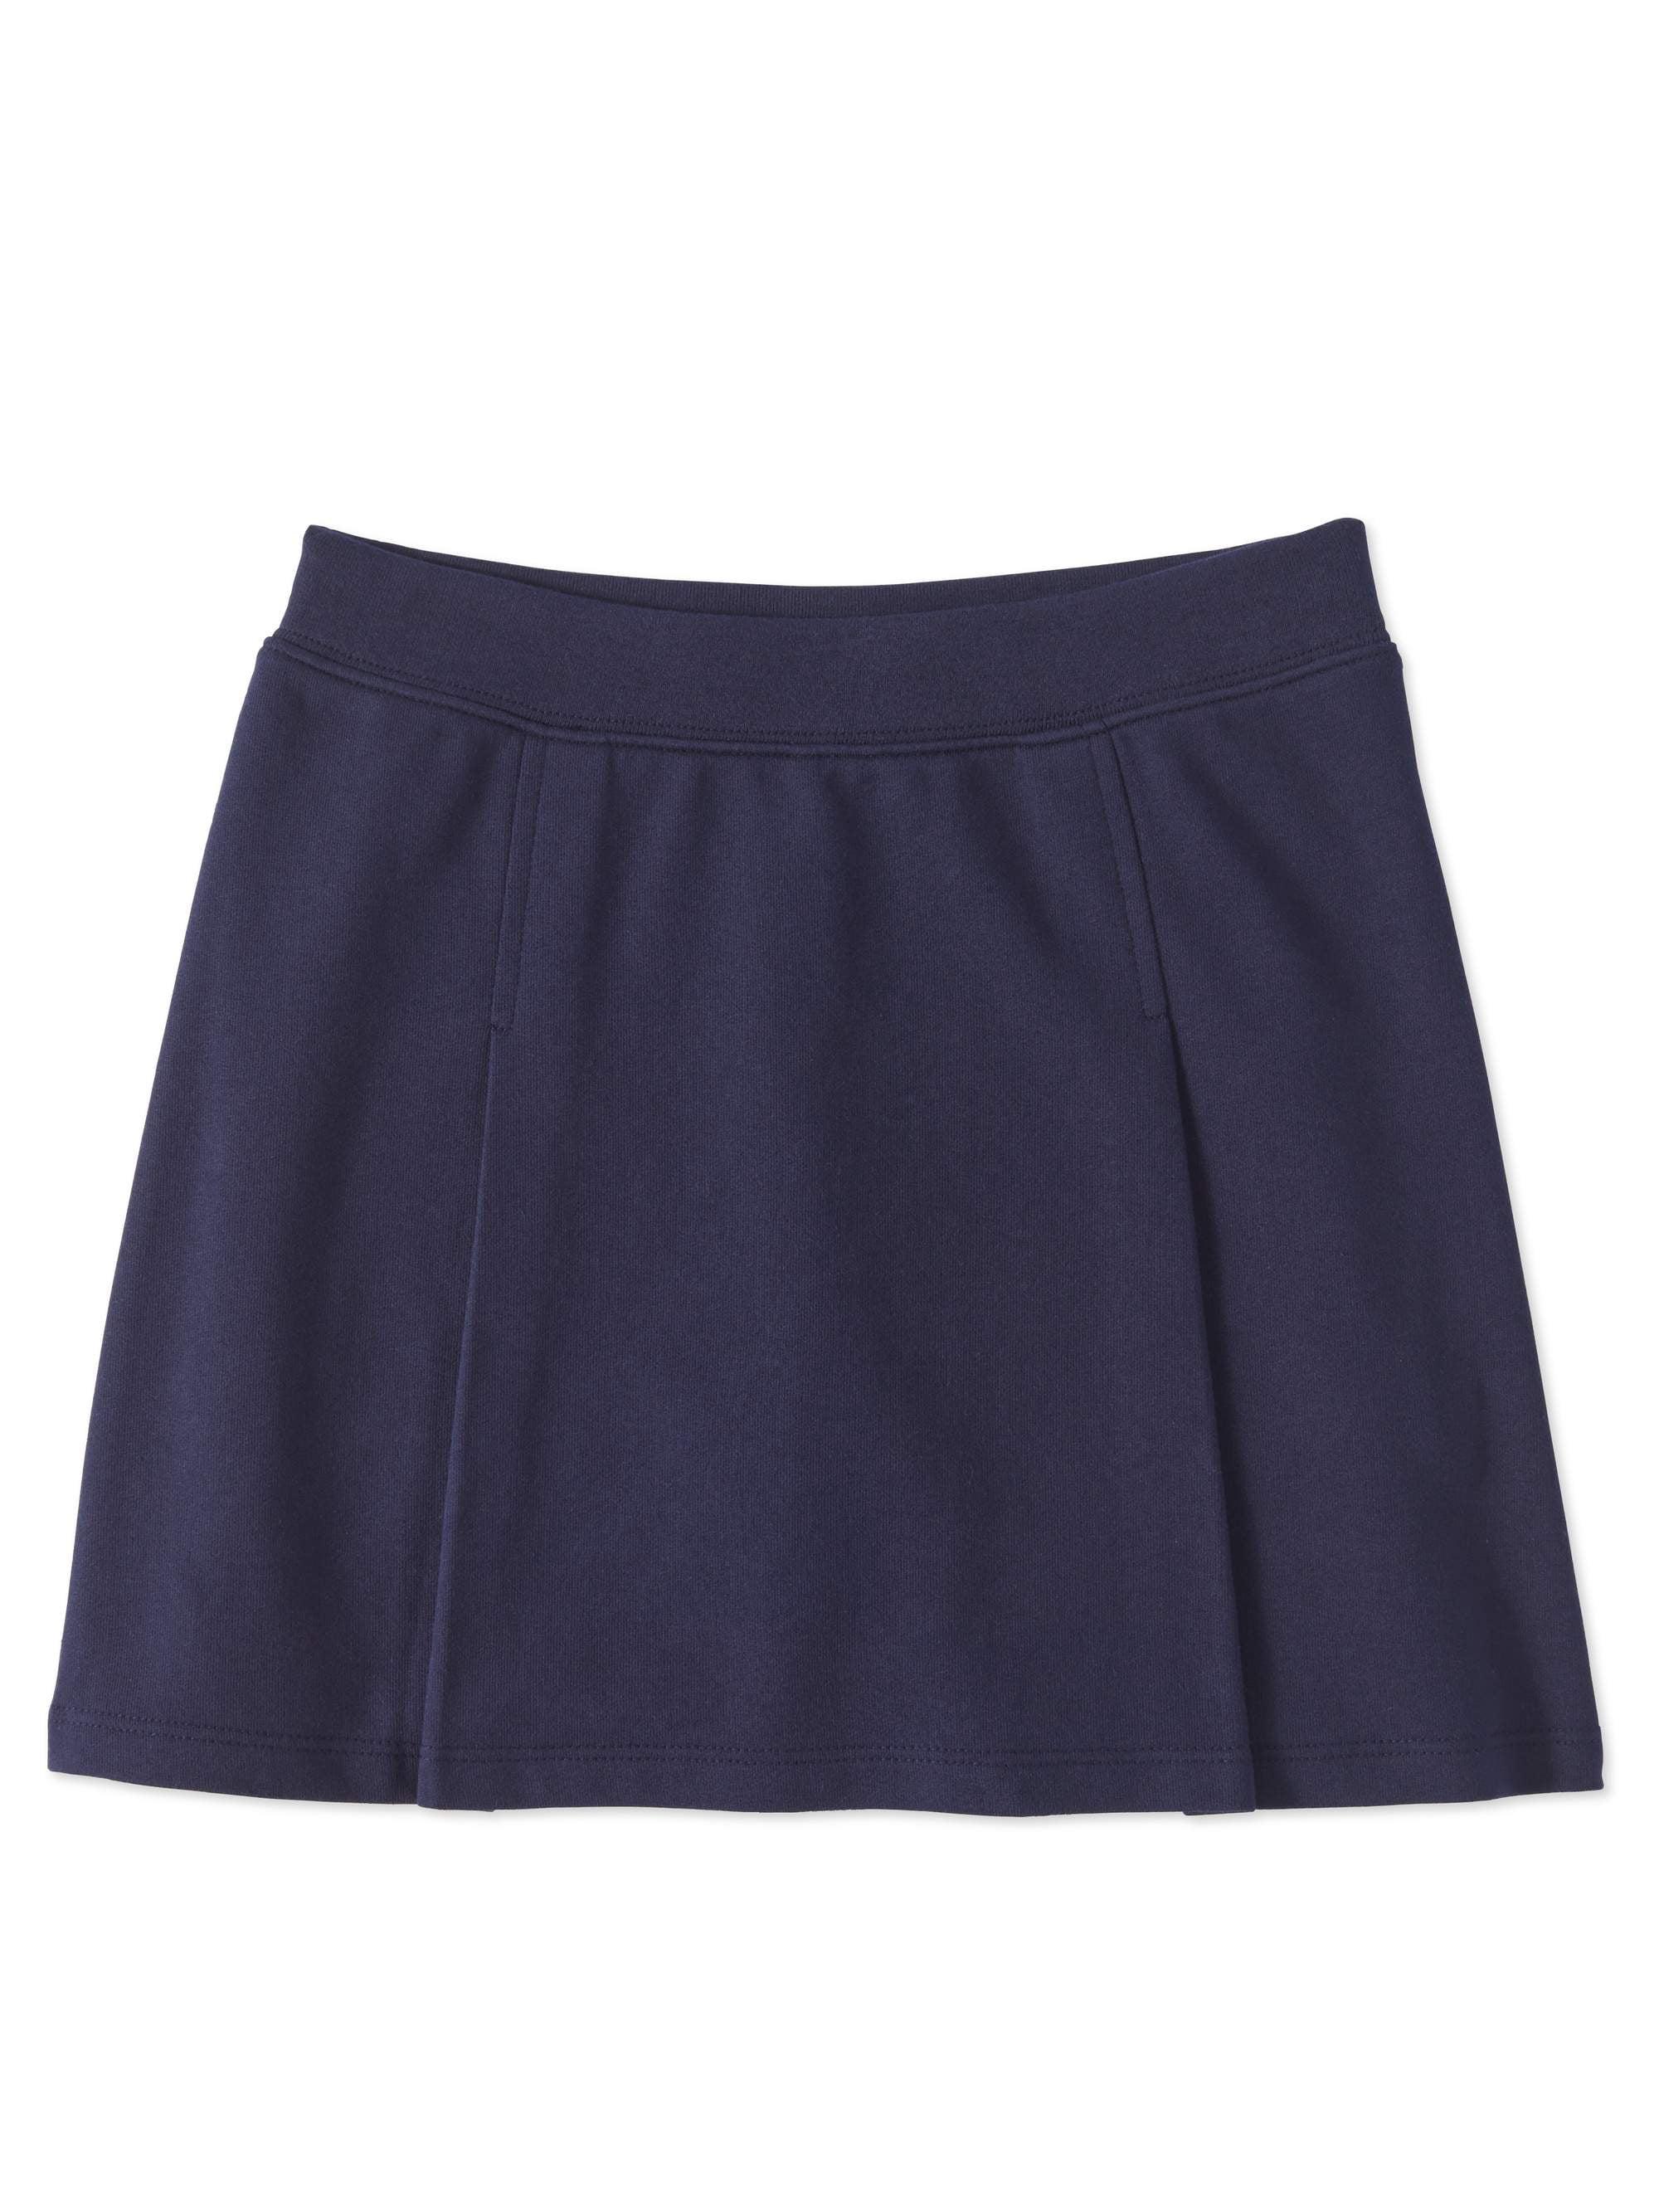 Girls Plus School Uniform Knit Scooter